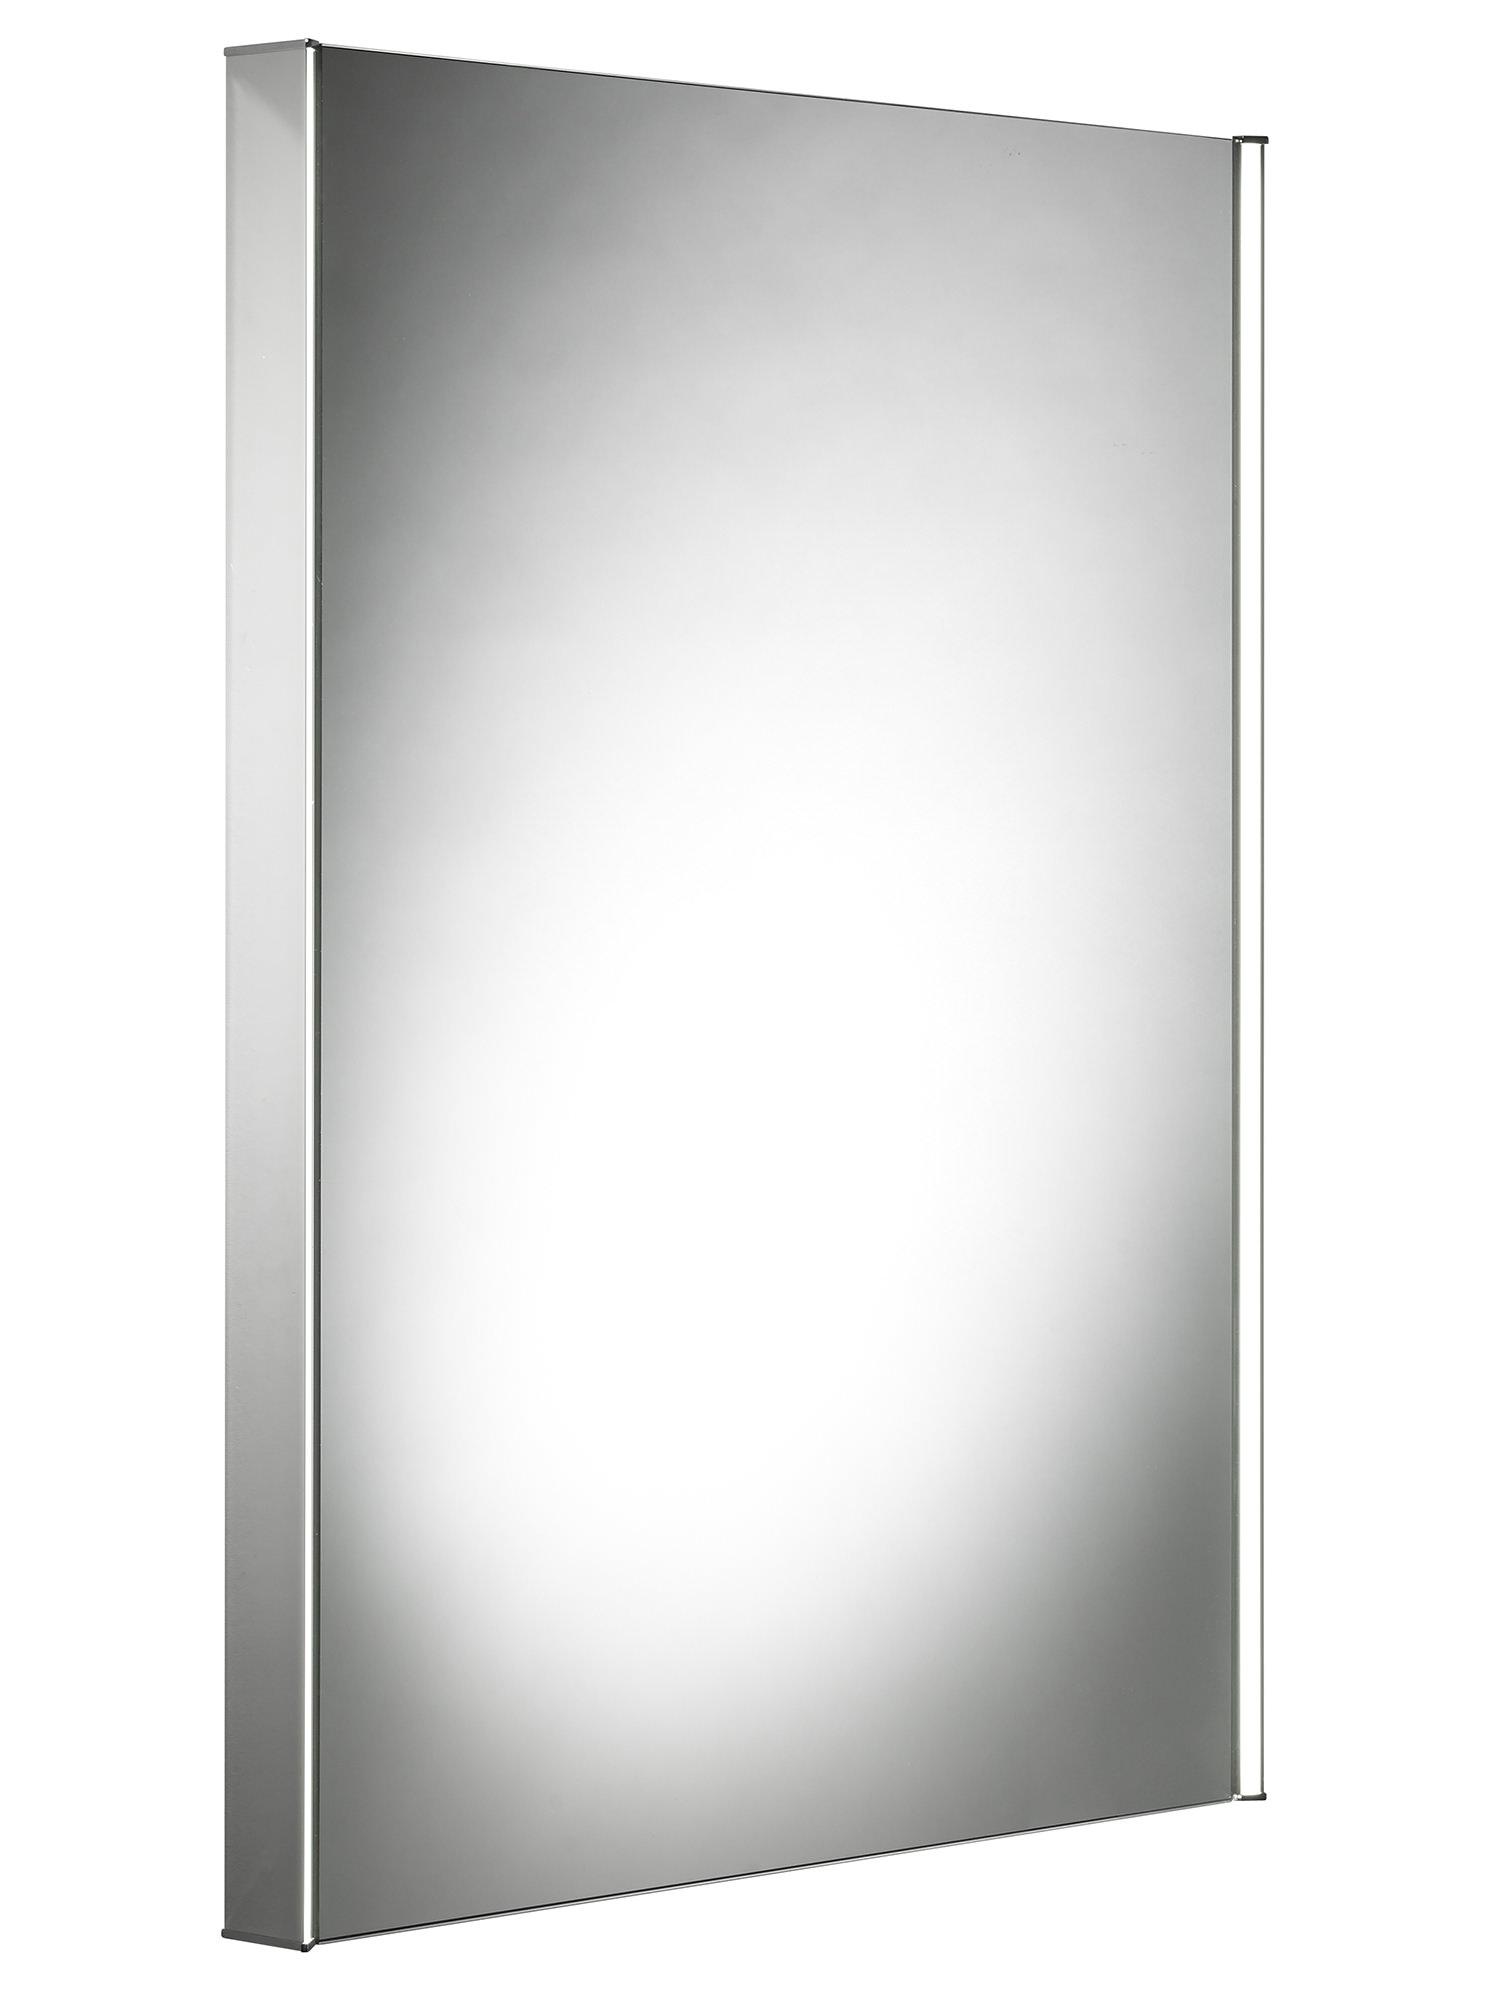 Roper rhodes precise illuminated mirror mle470 for Illuminated mirrors